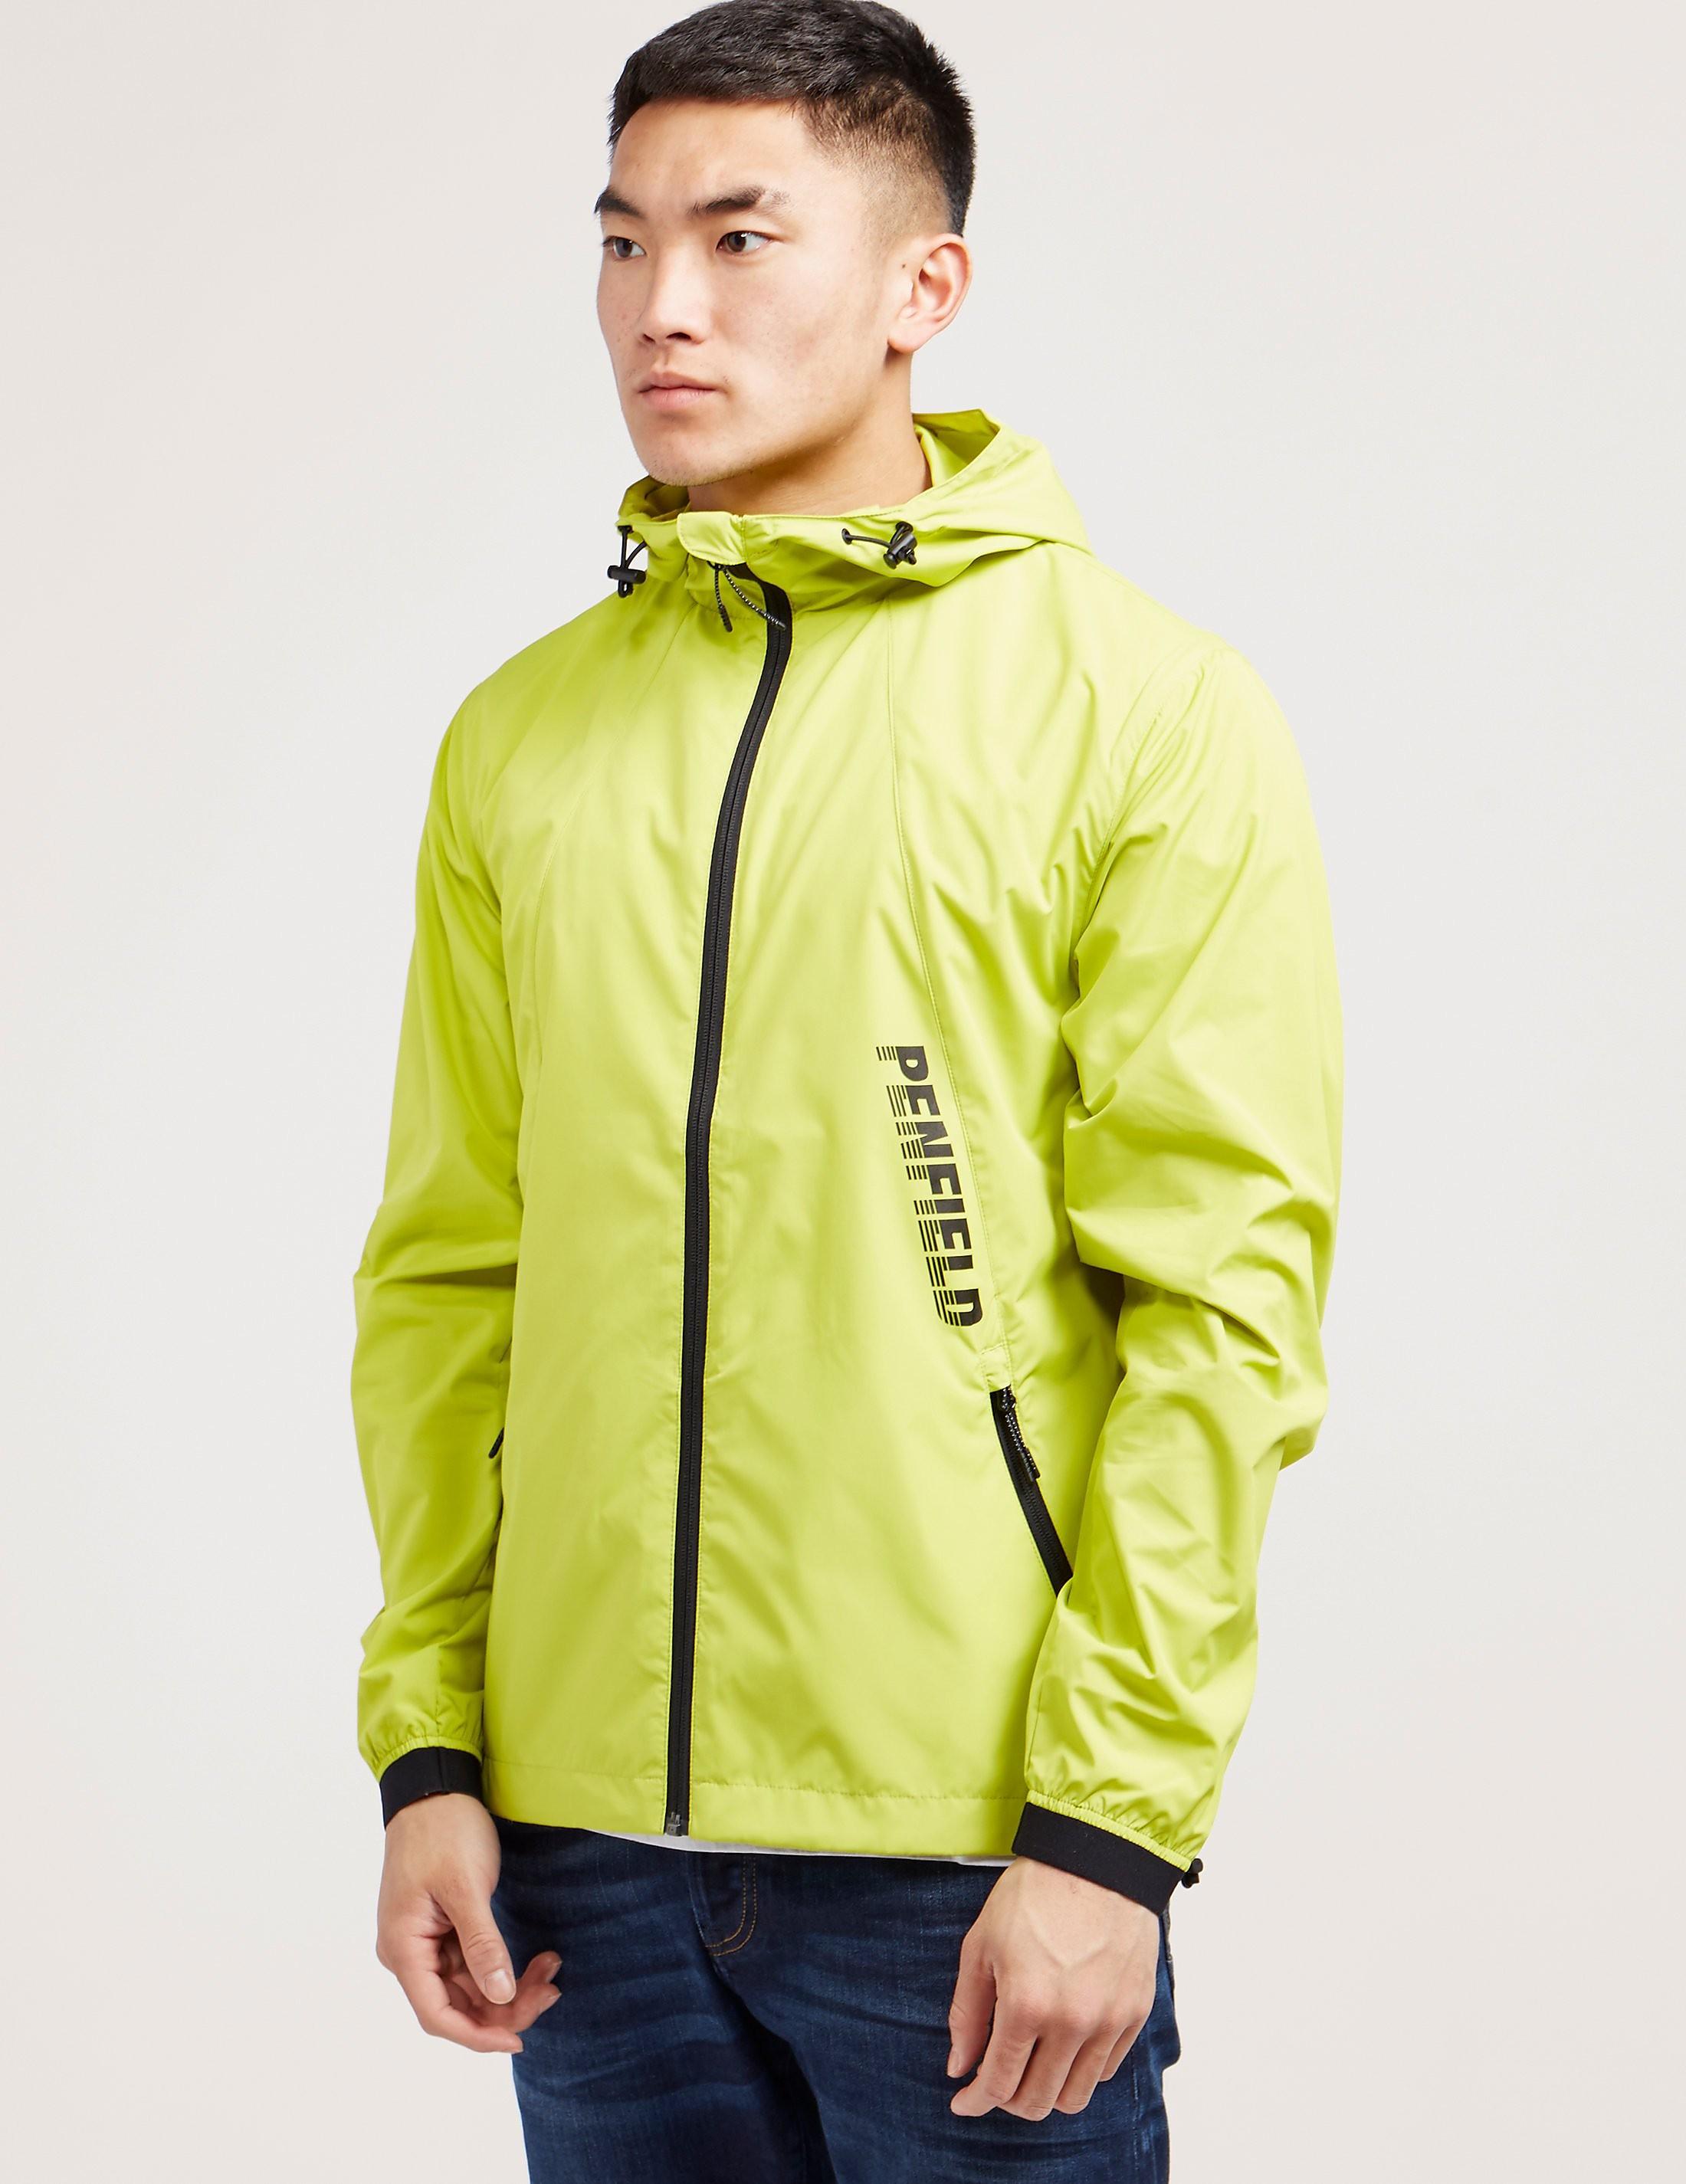 Penfield Storm Lightweight Trail Jacket